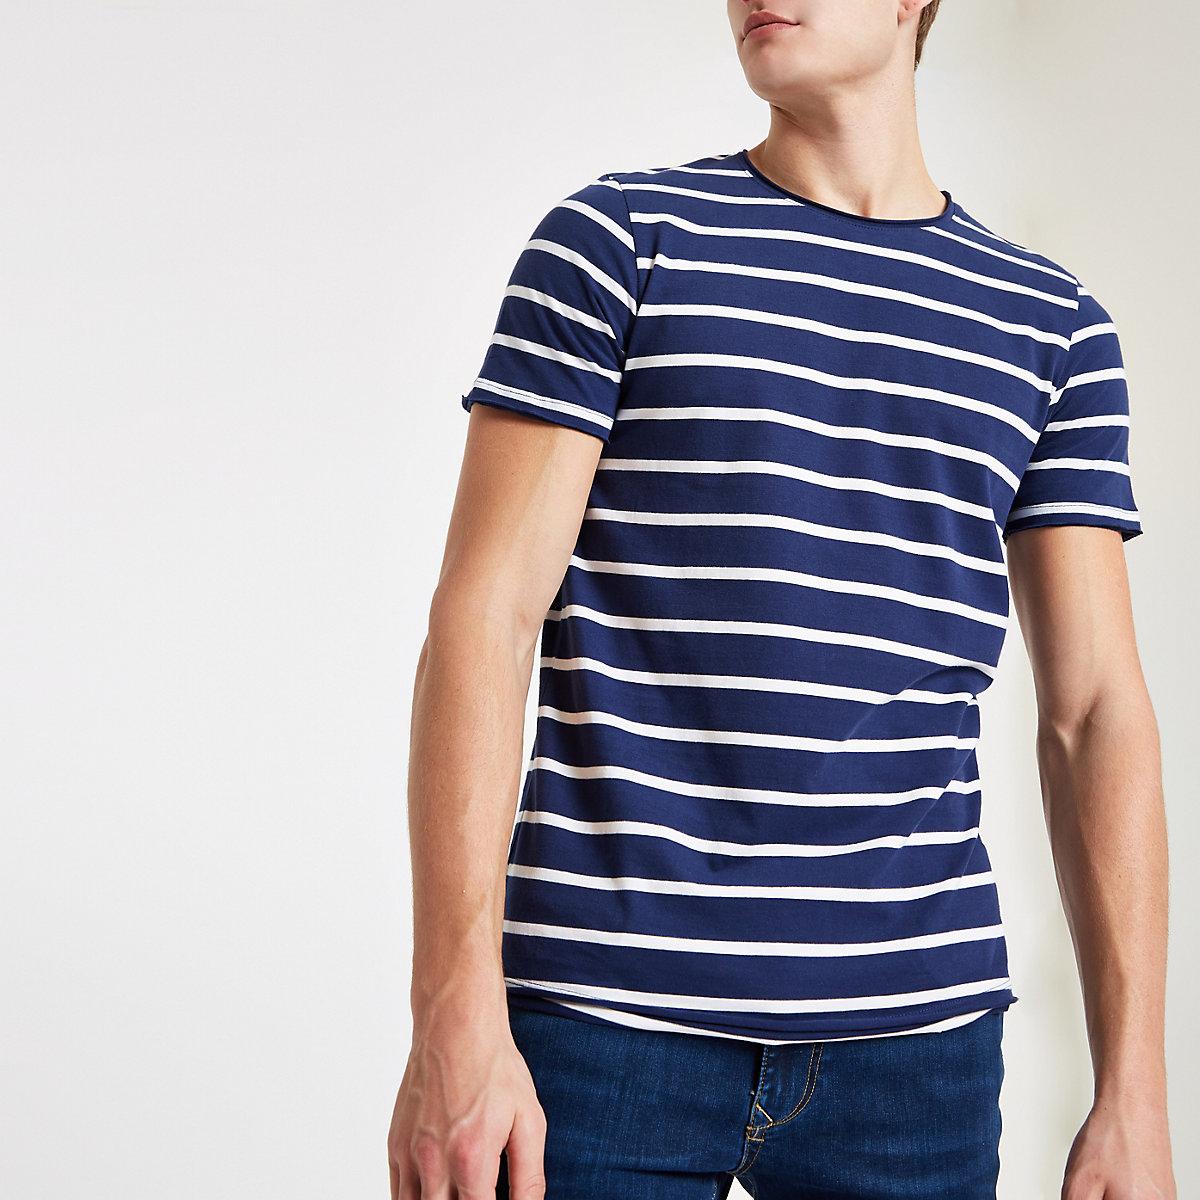 Jack & Jones navy stripe T-shirt